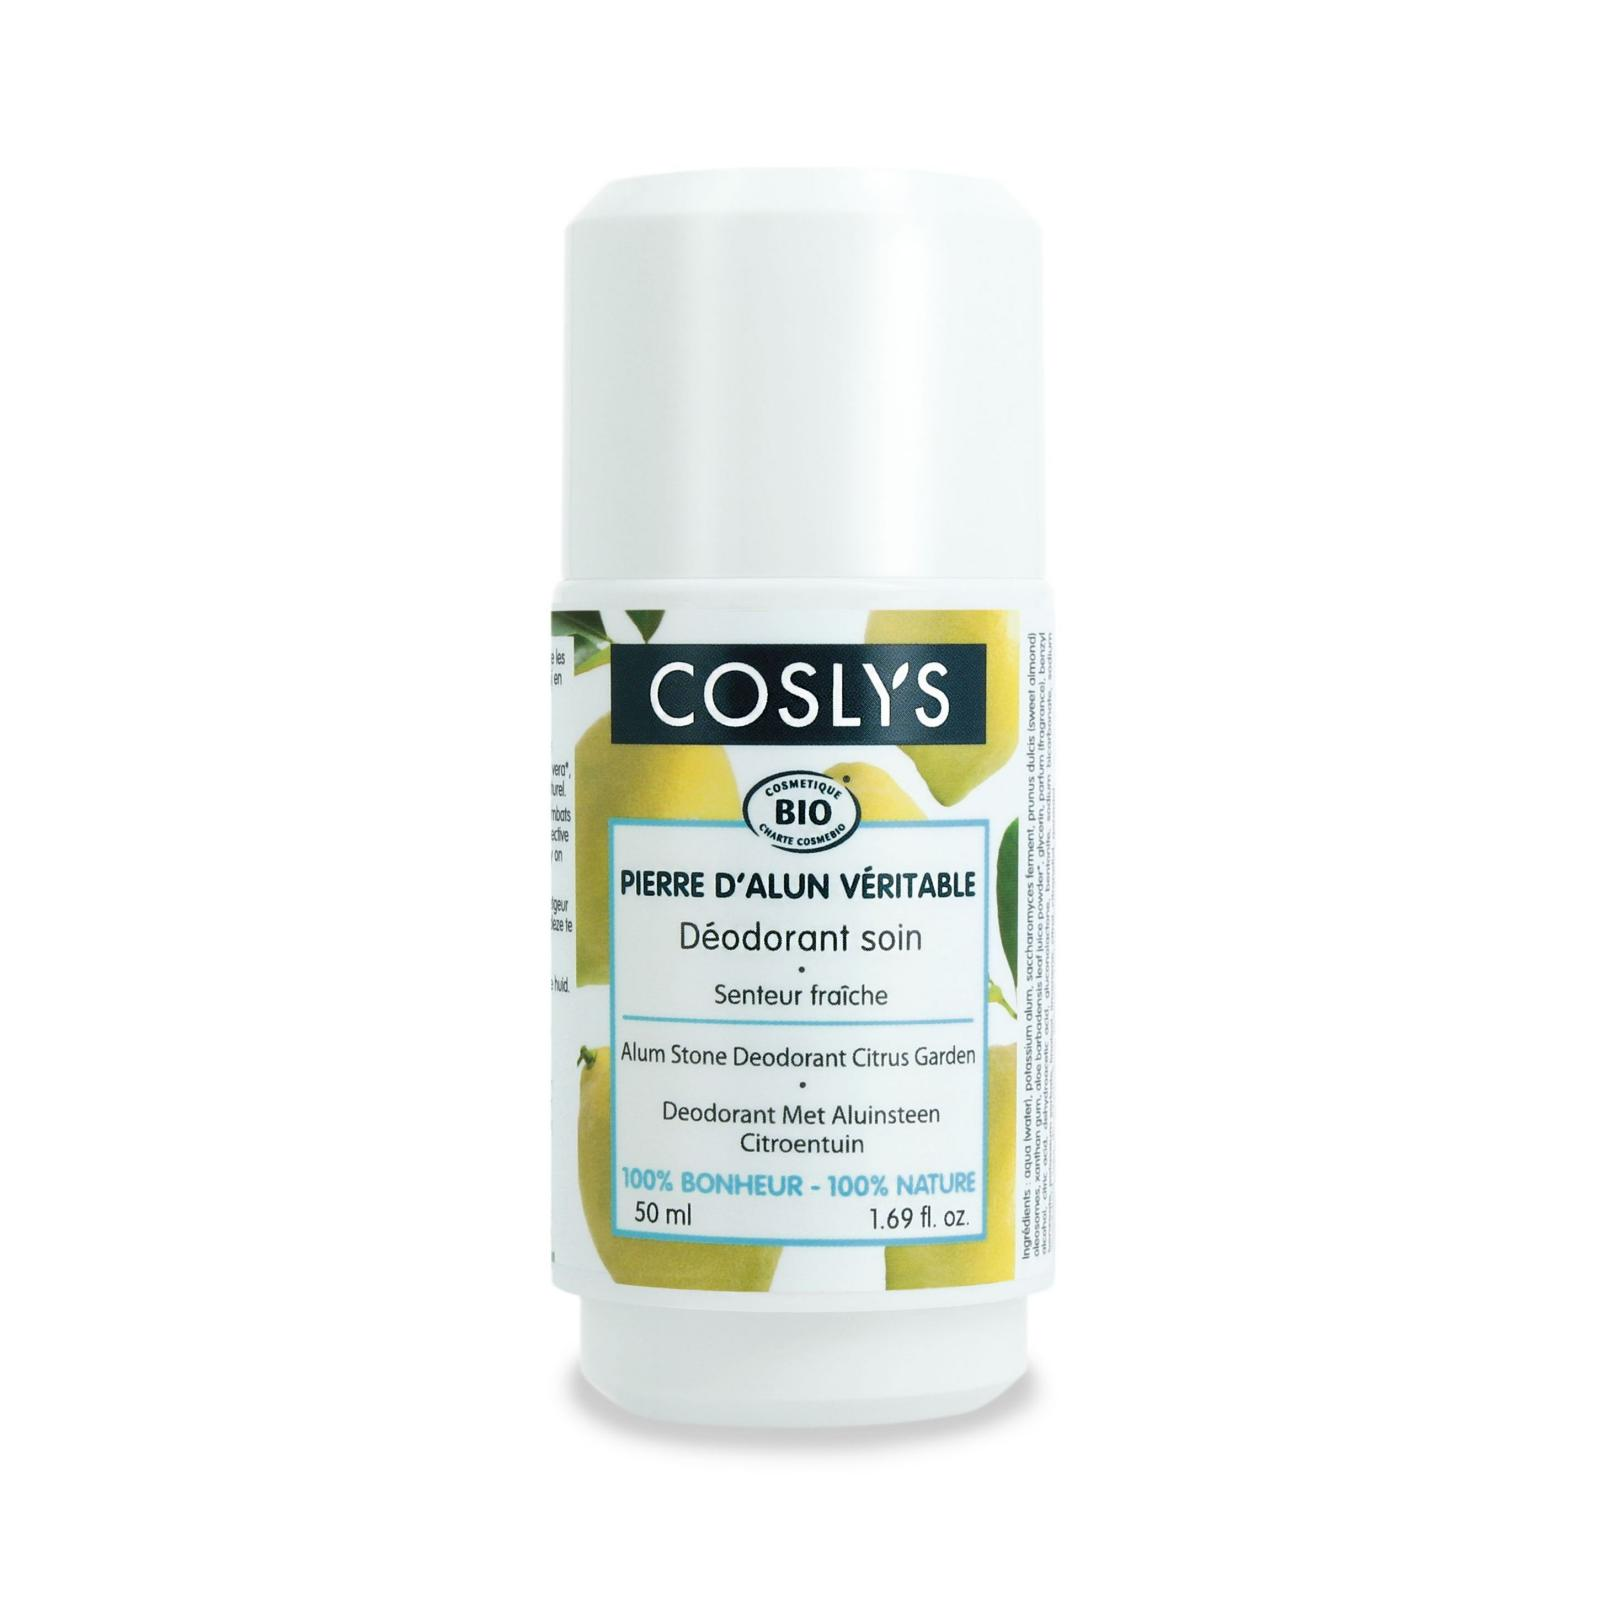 Coslys Deodorant citrusová zahrada 50 ml roll-on